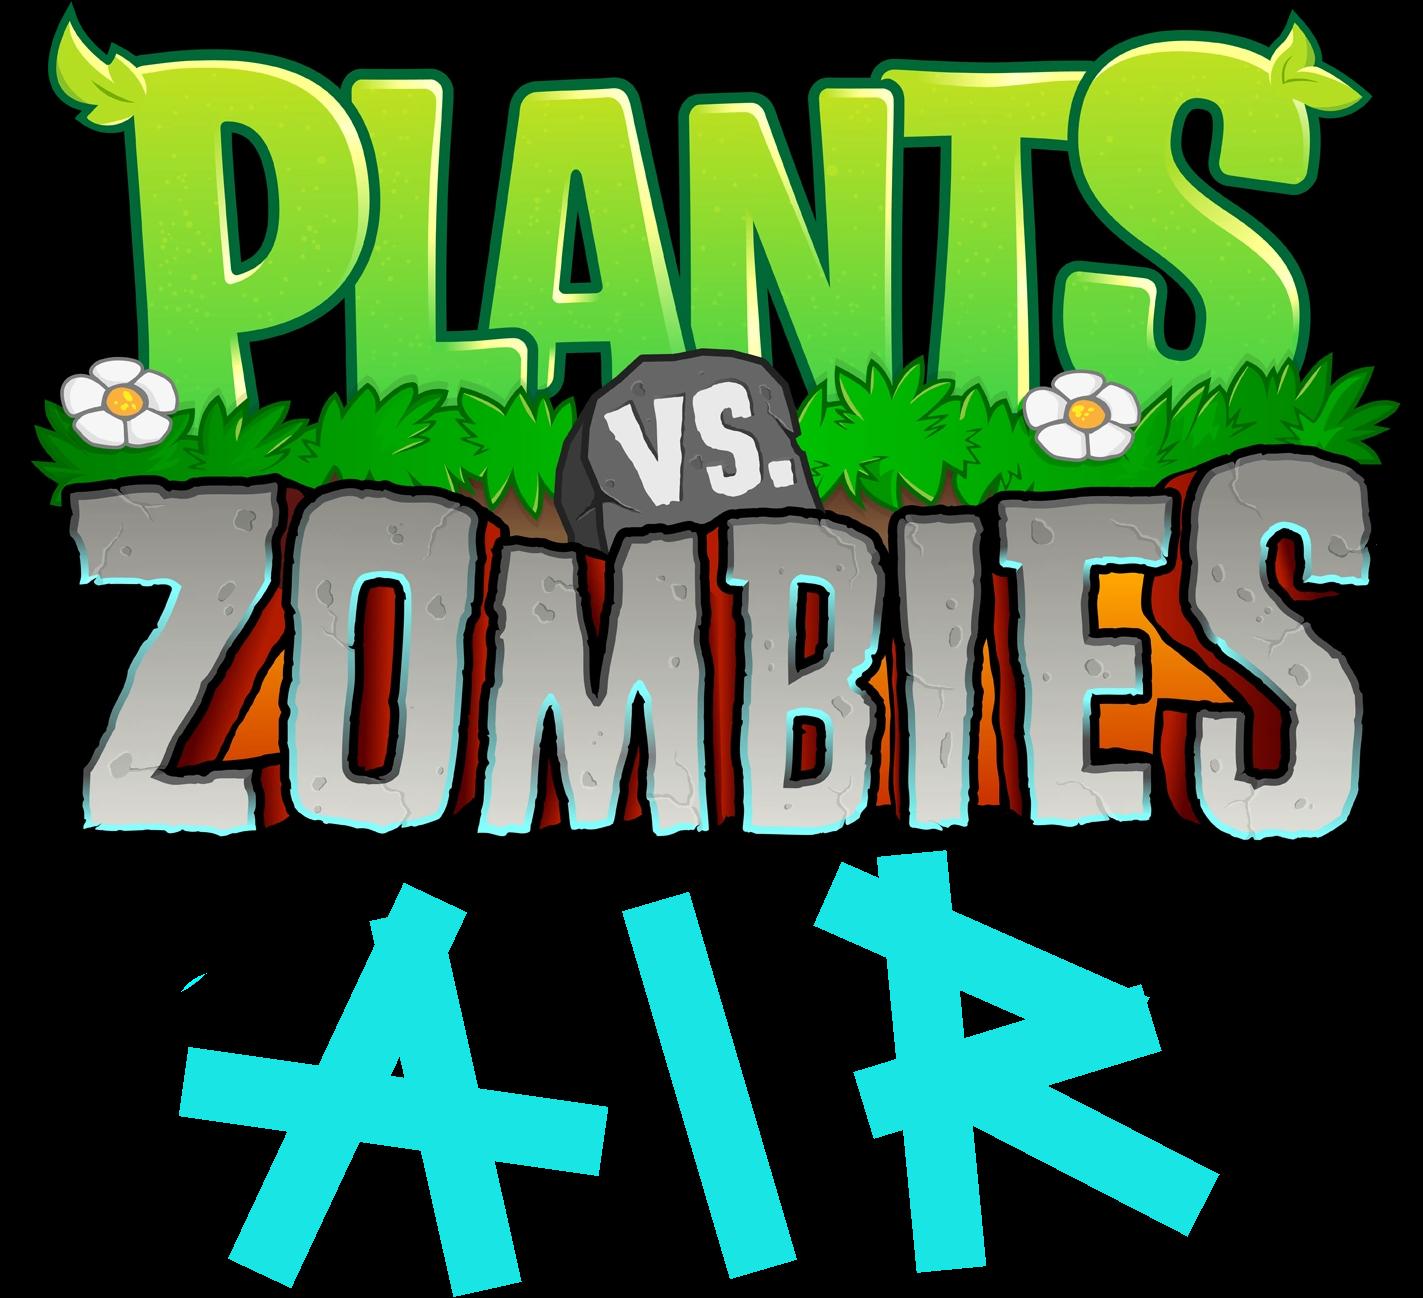 Zombie clipart zombie graveyard. Plants vs zombies hot